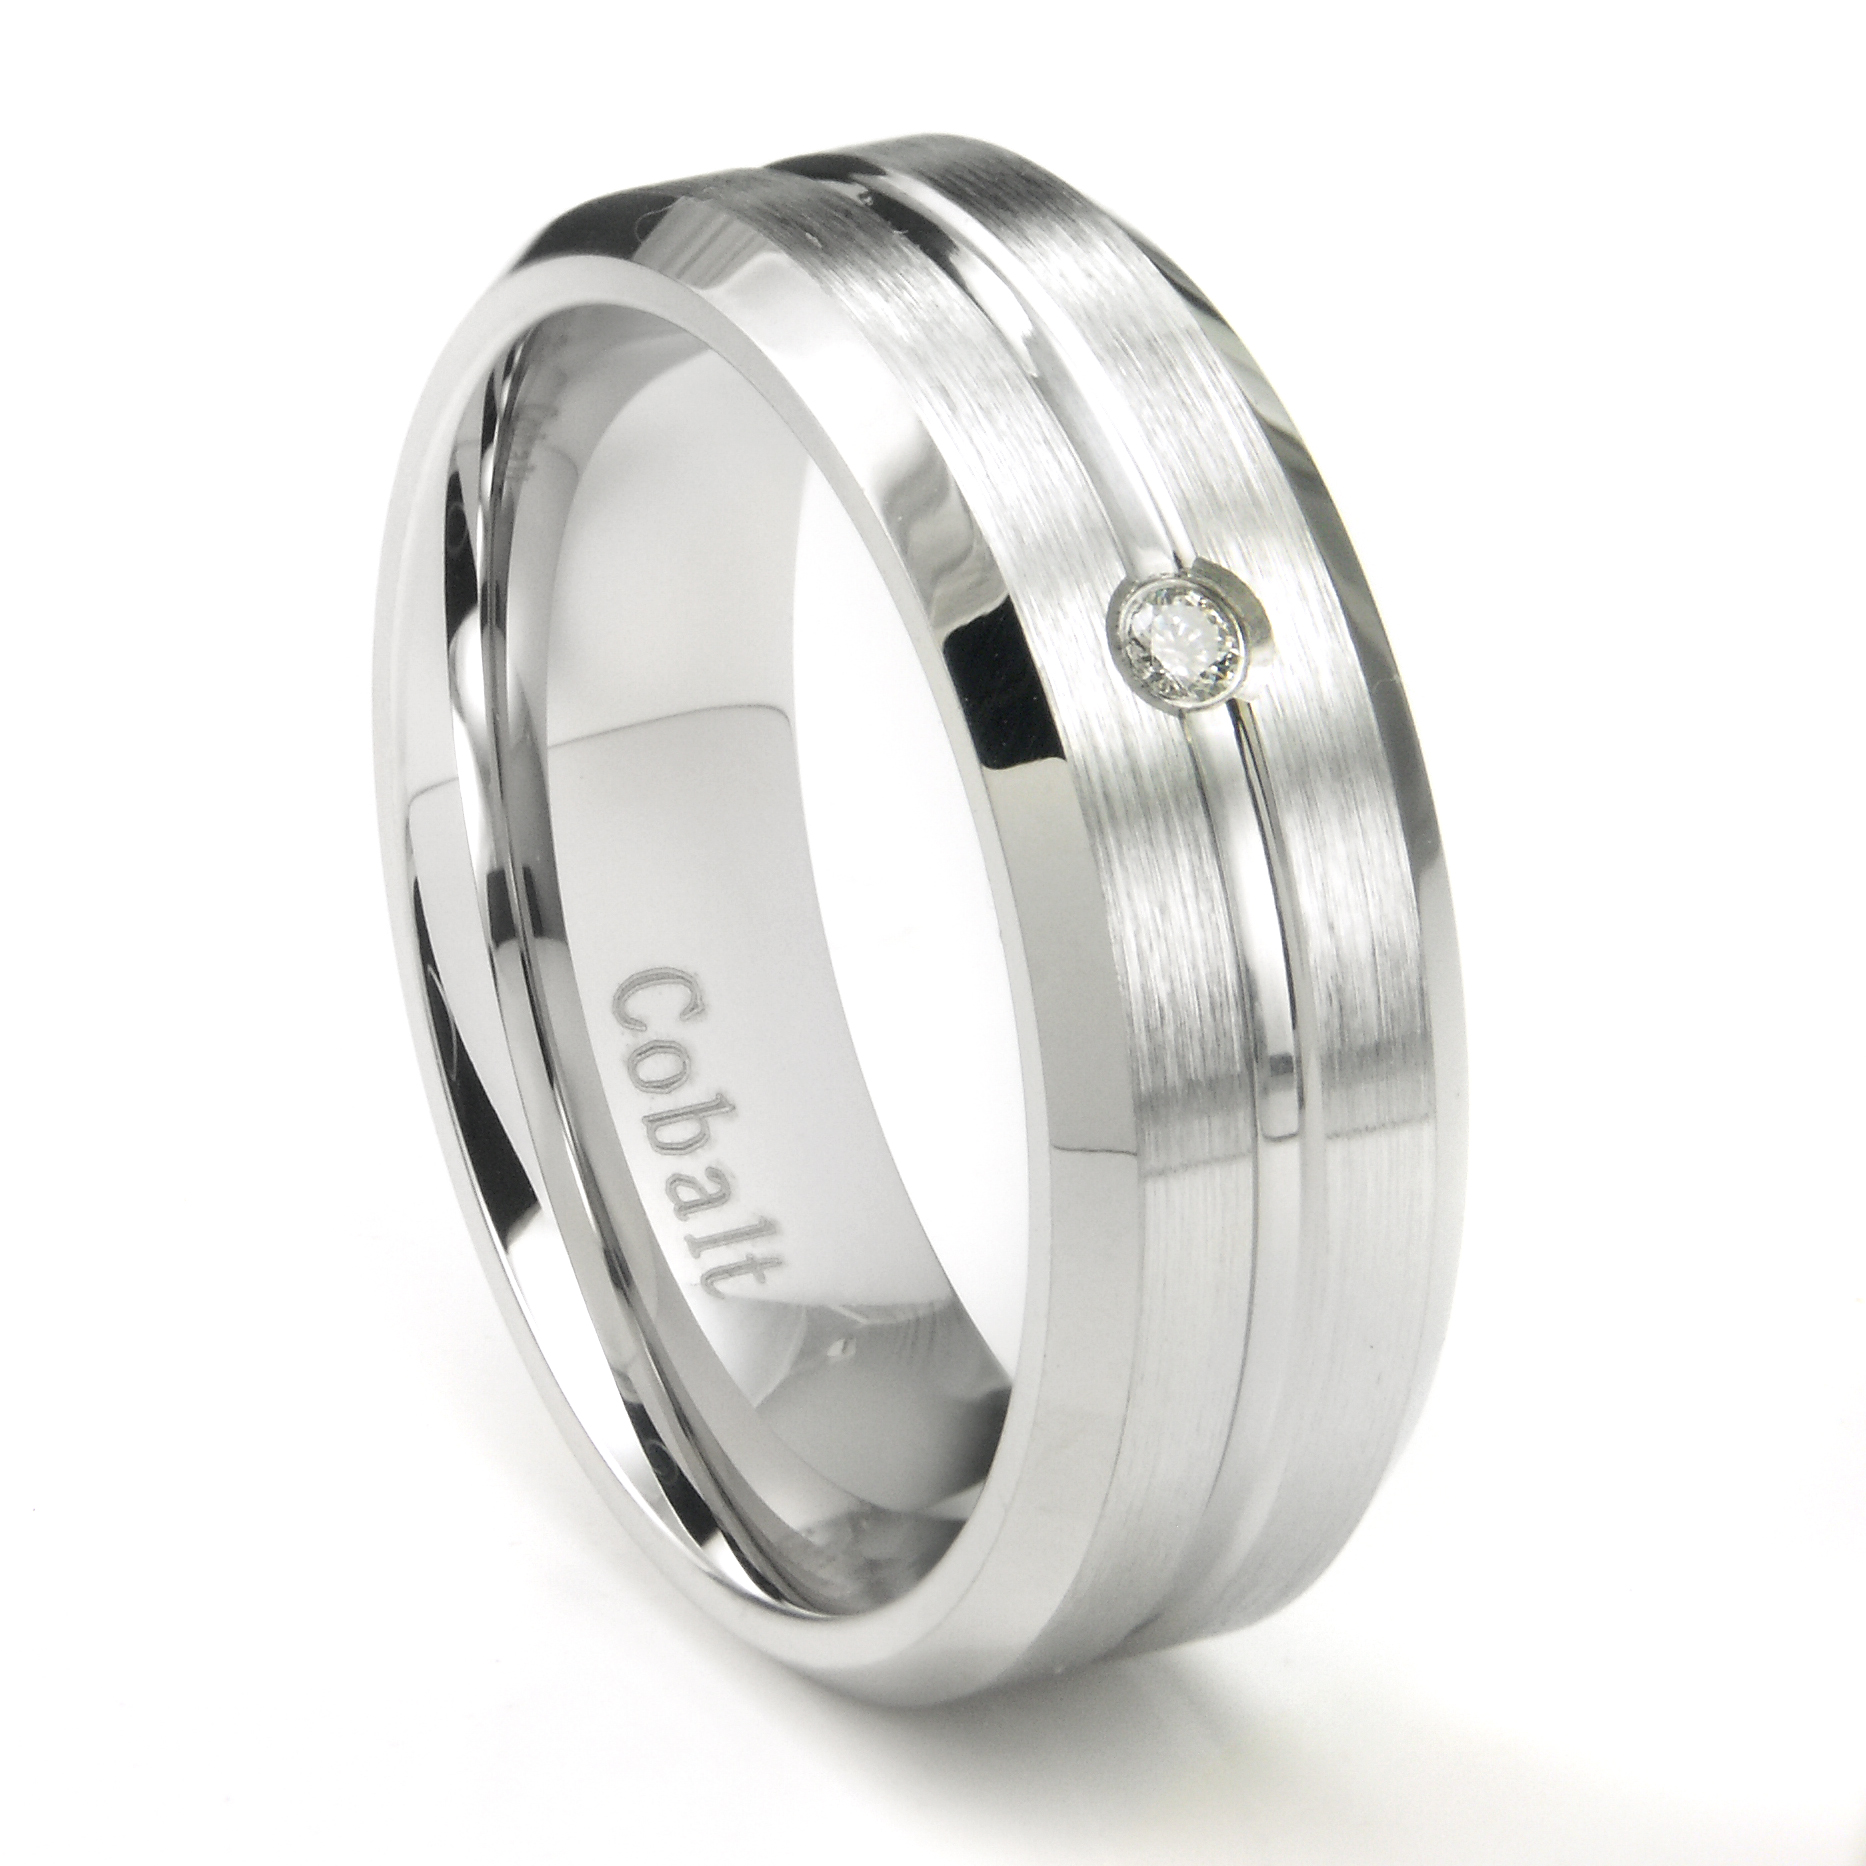 Cobalt Chrome Wedding Bands and Rings Titanium Kay